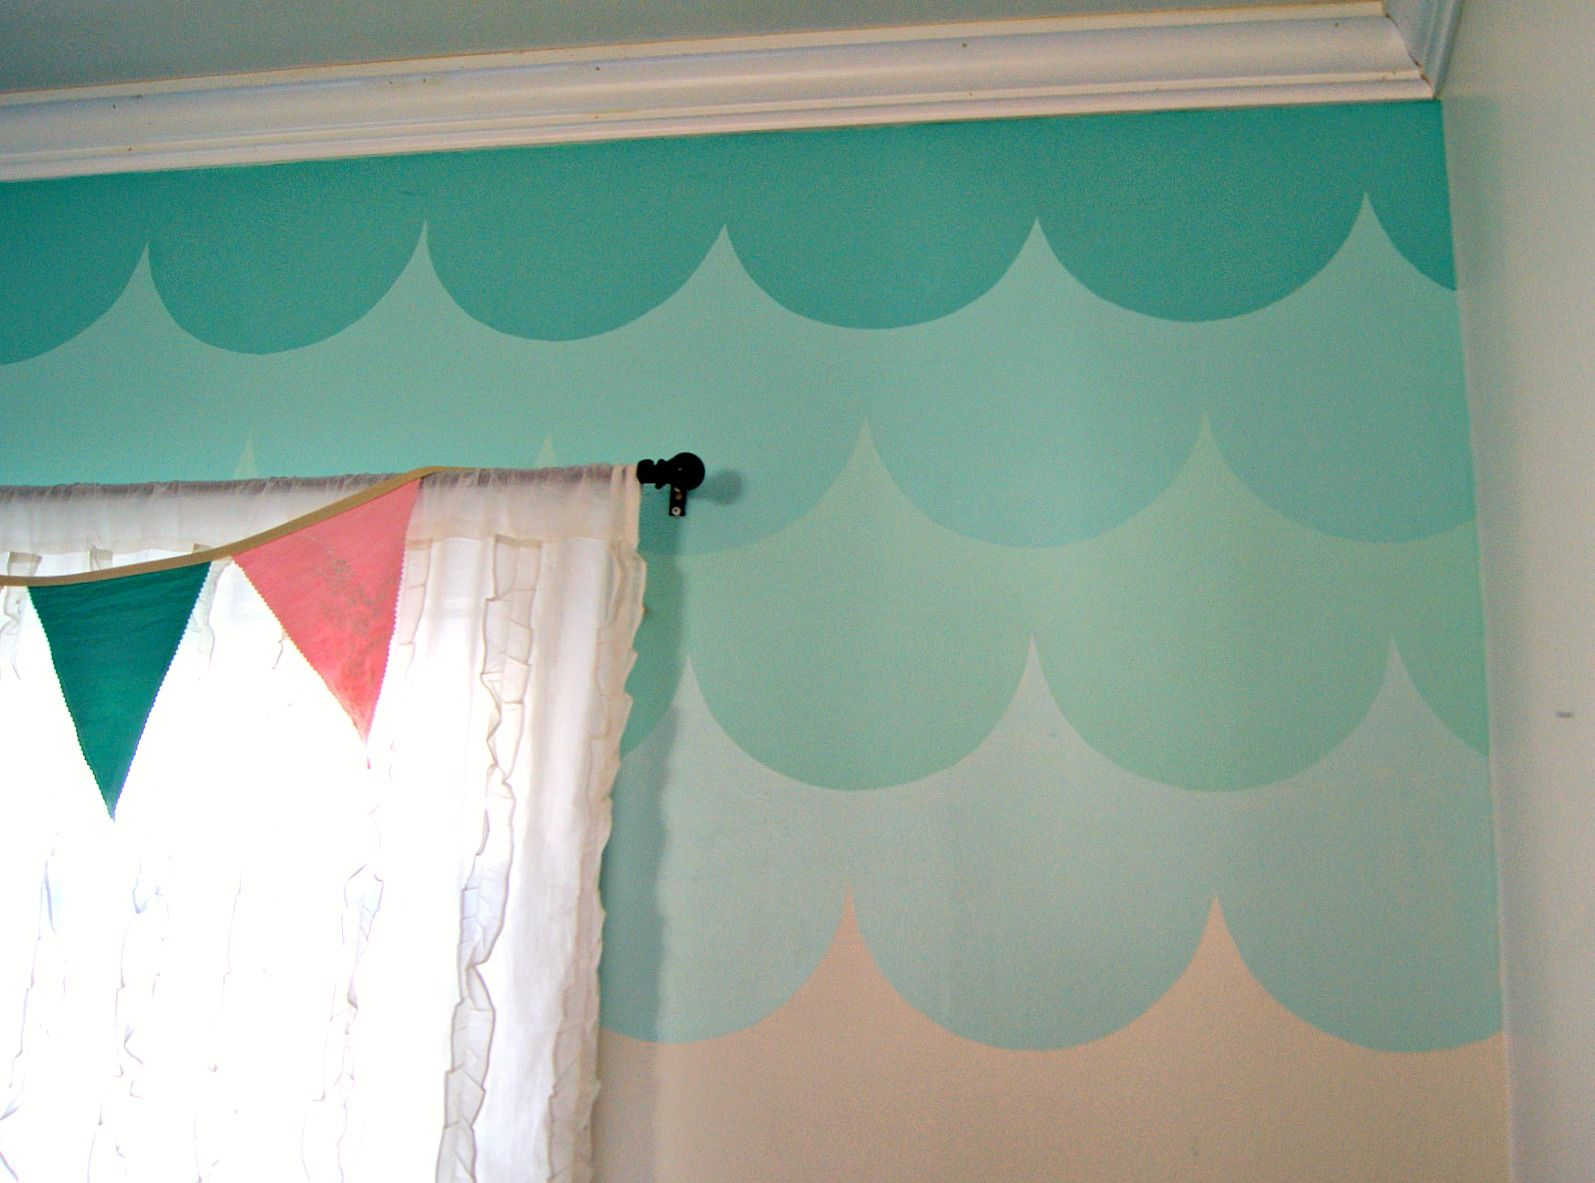 Accent wall paint ideas bathroom - 100 Interior Painting Ideas